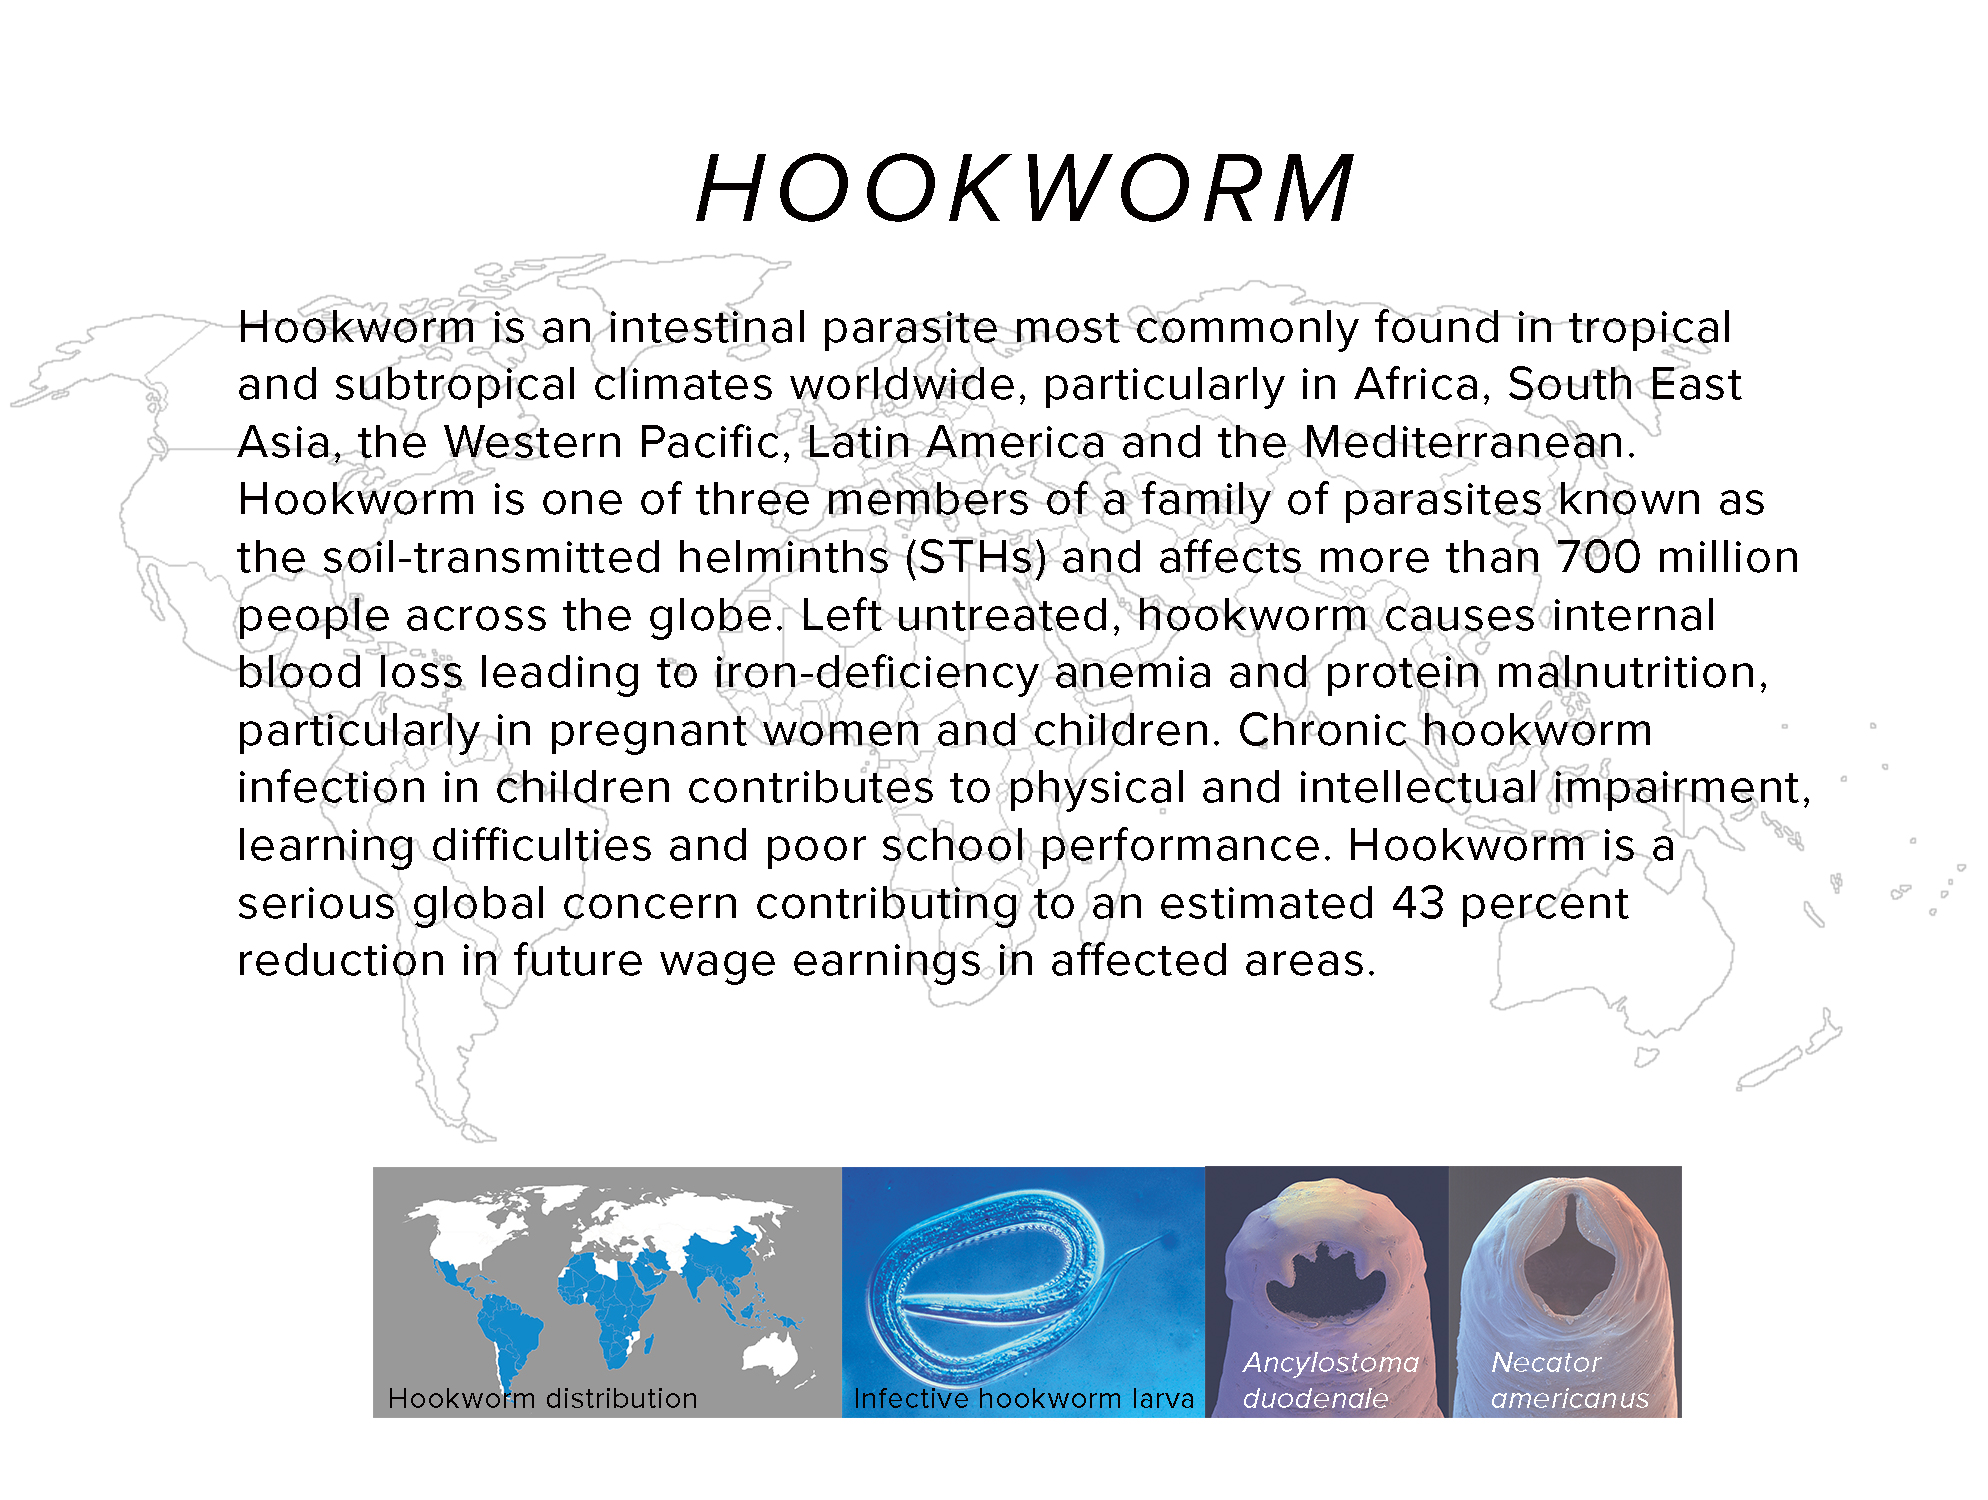 pwb_hookworm.jpg